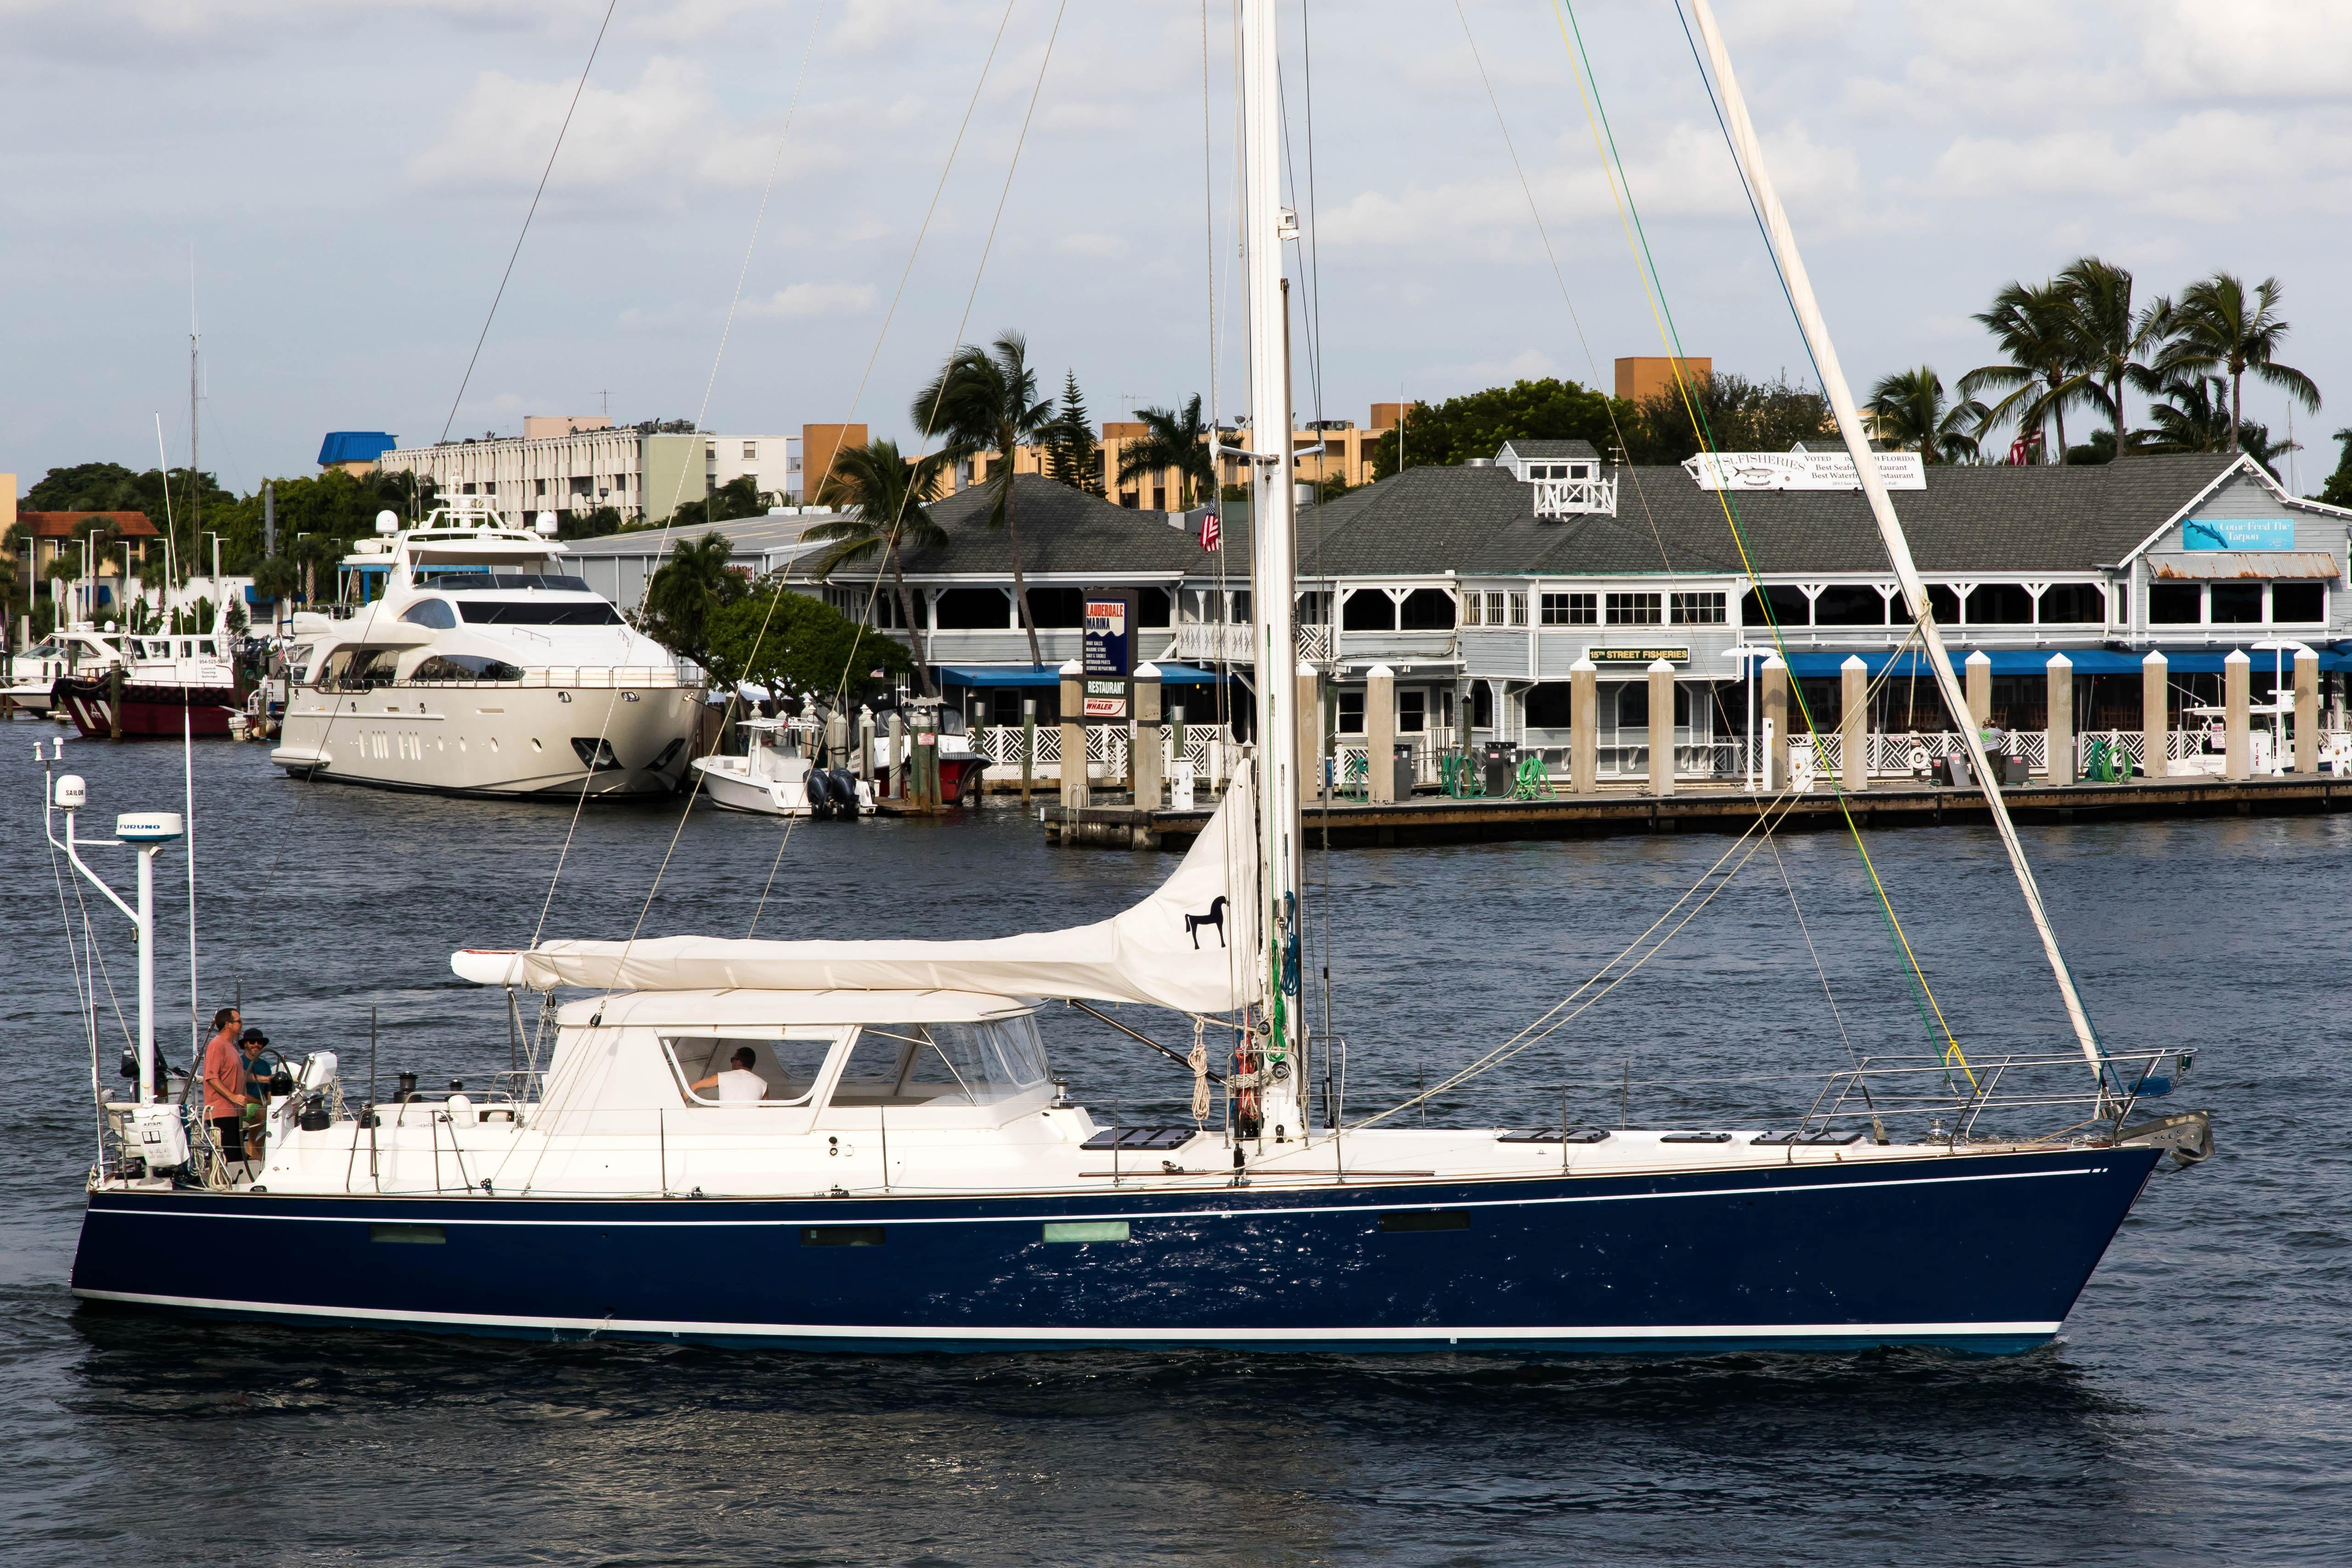 1987 Deerfoot 2 62 Sail Boat For Sale Wwwyachtworldcom